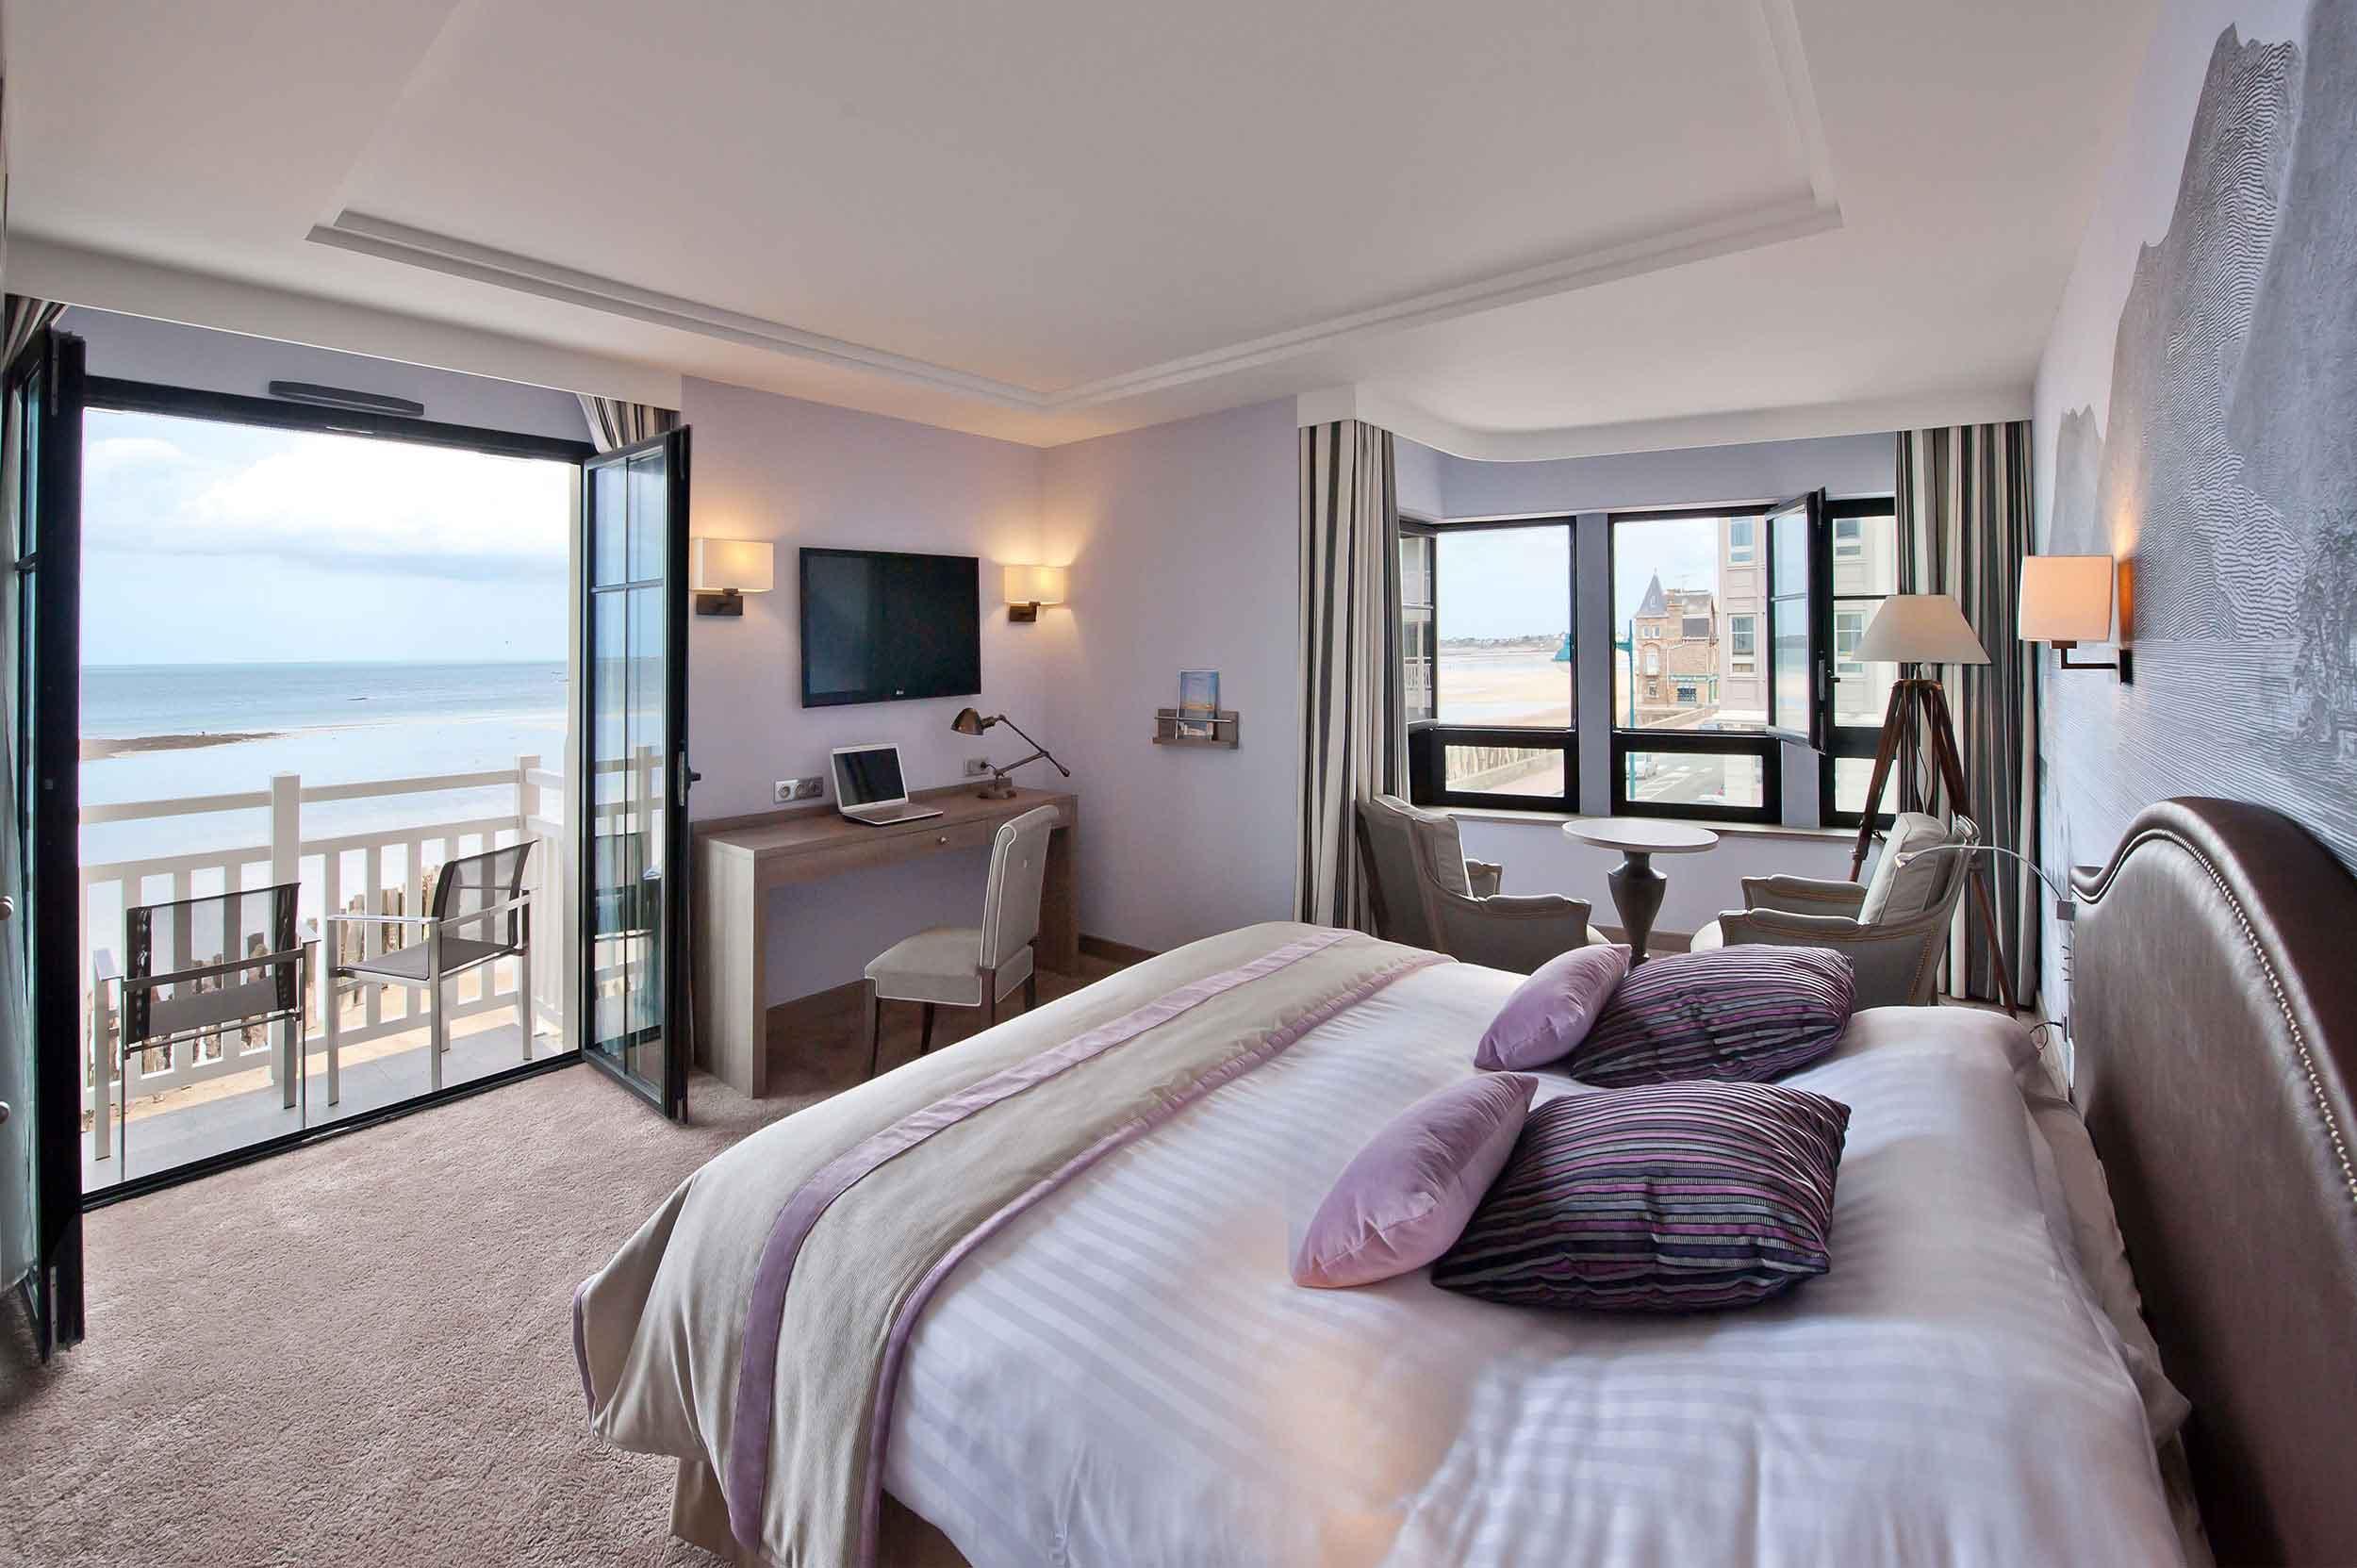 H tel 4 toiles en bretagne vue mer saint malo for Chambre de hotel france